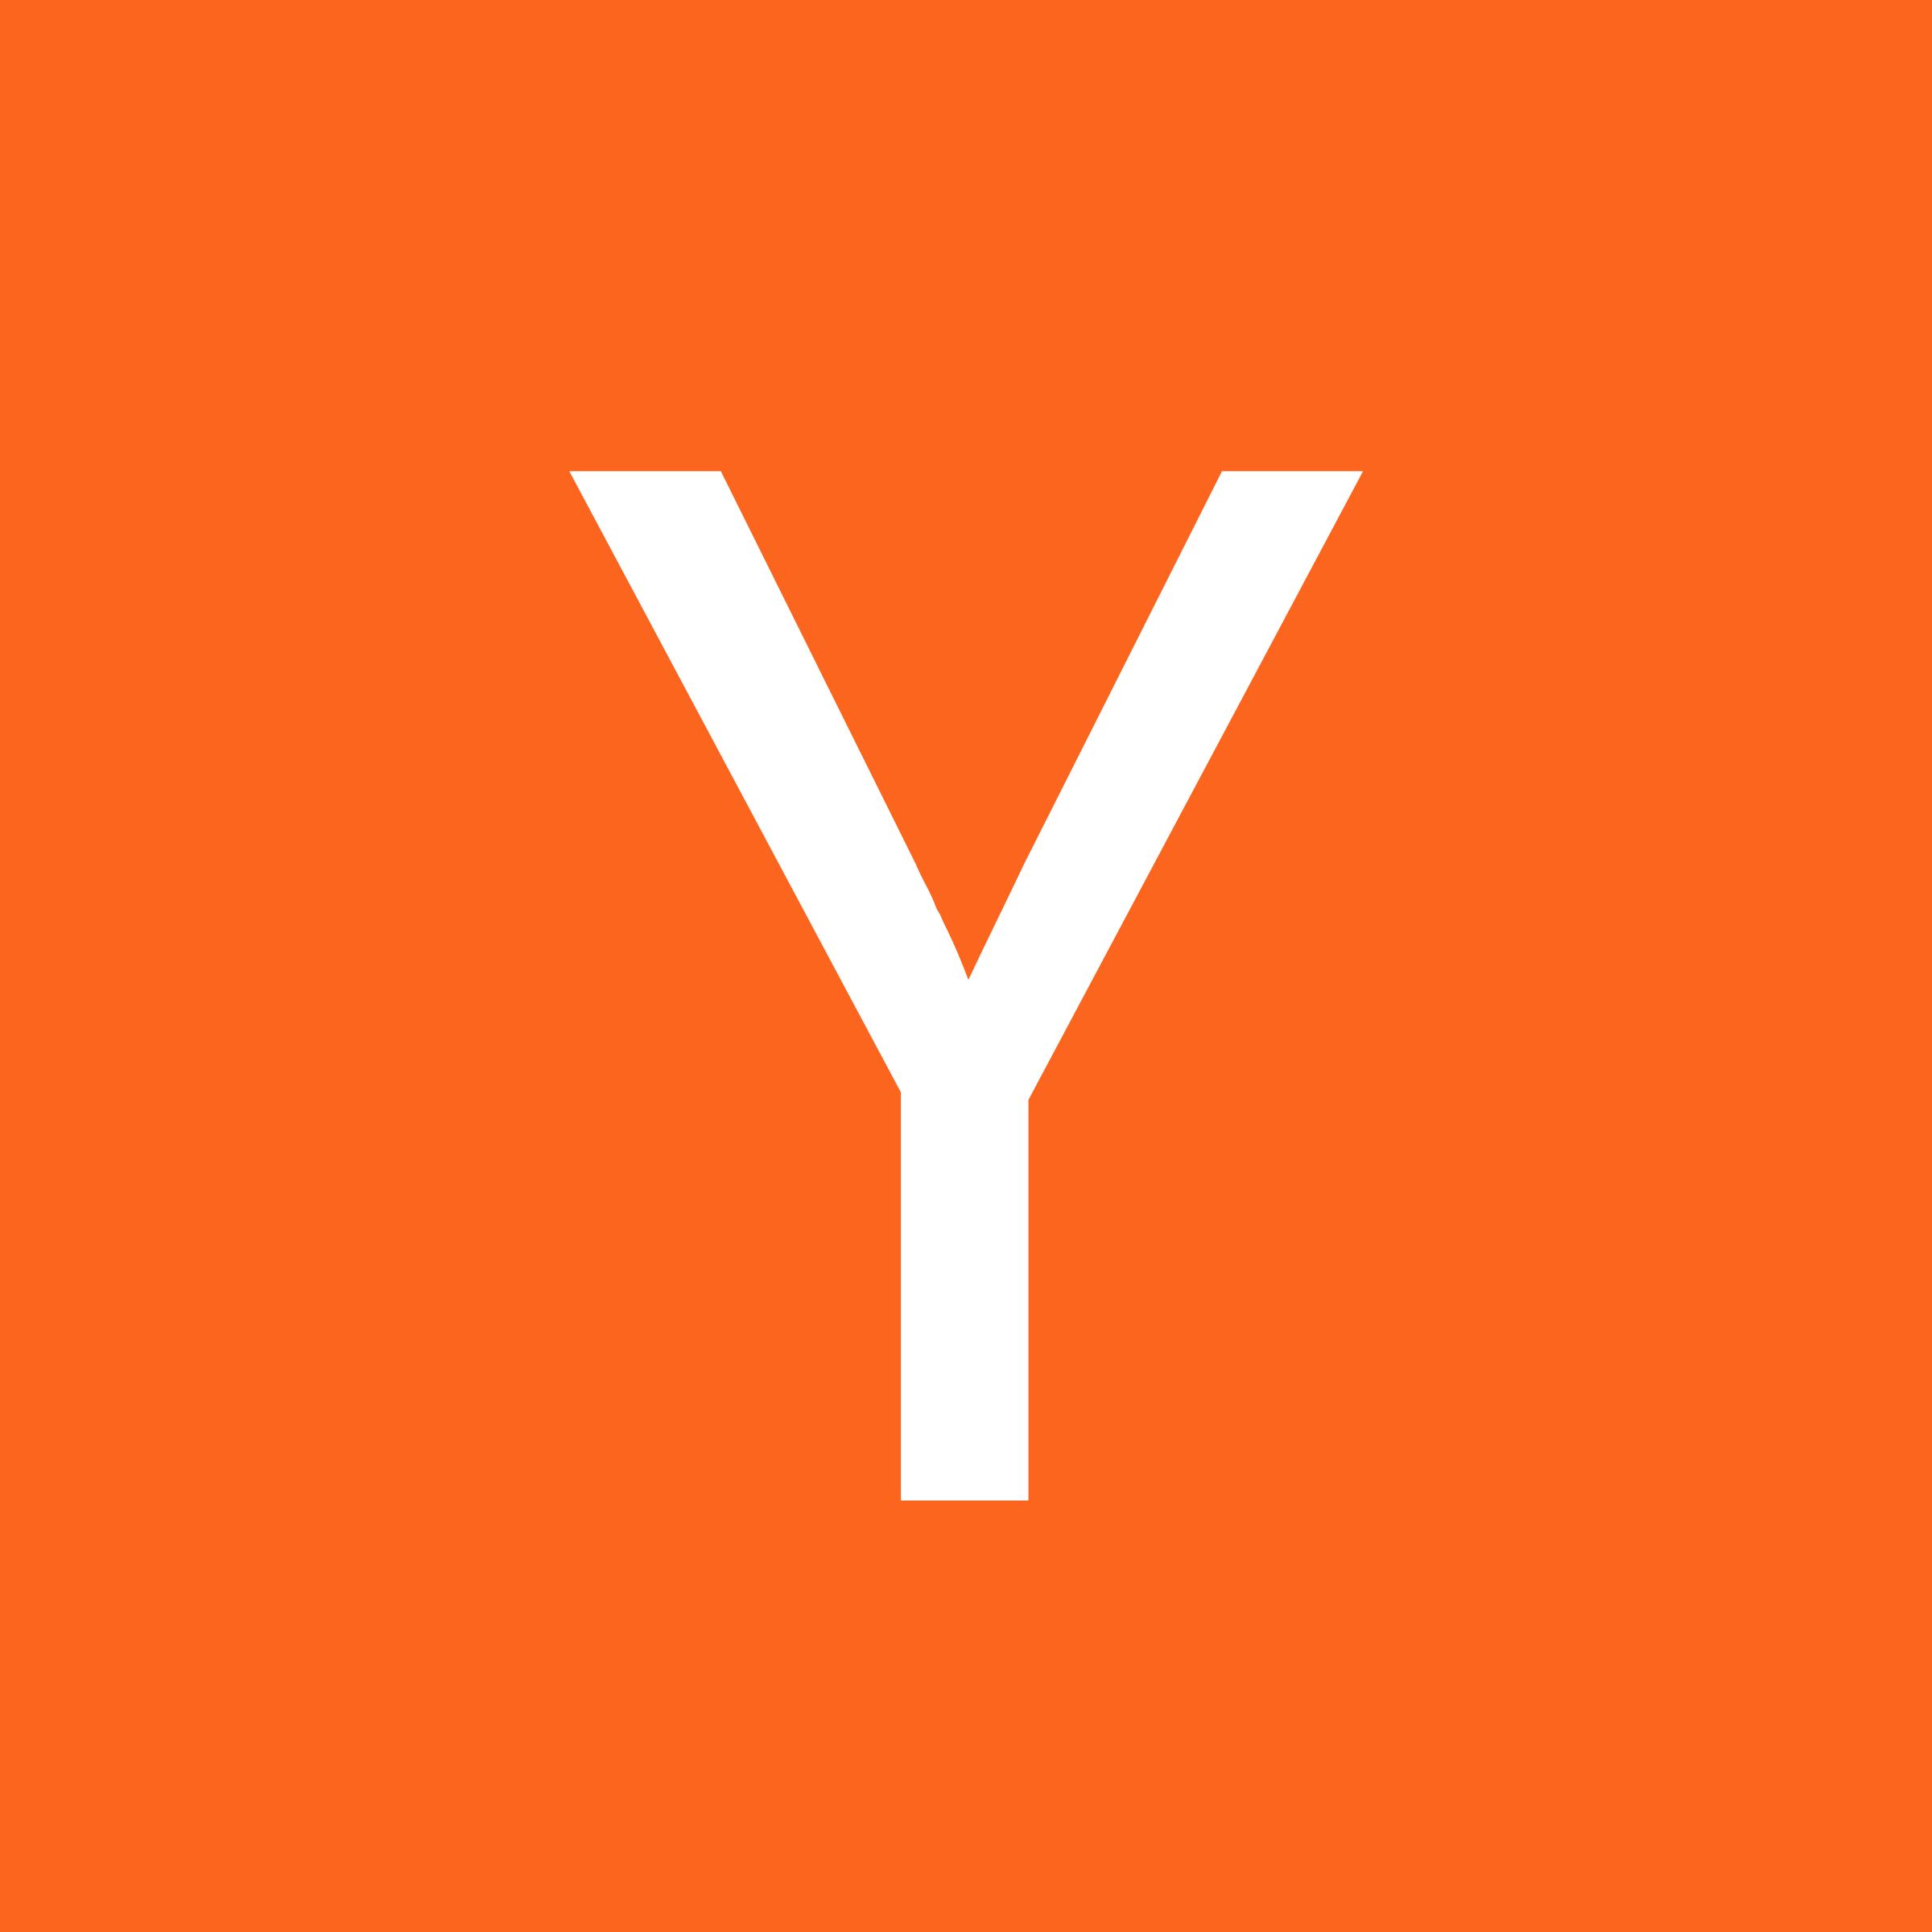 y-combinator-logo-png-transparent